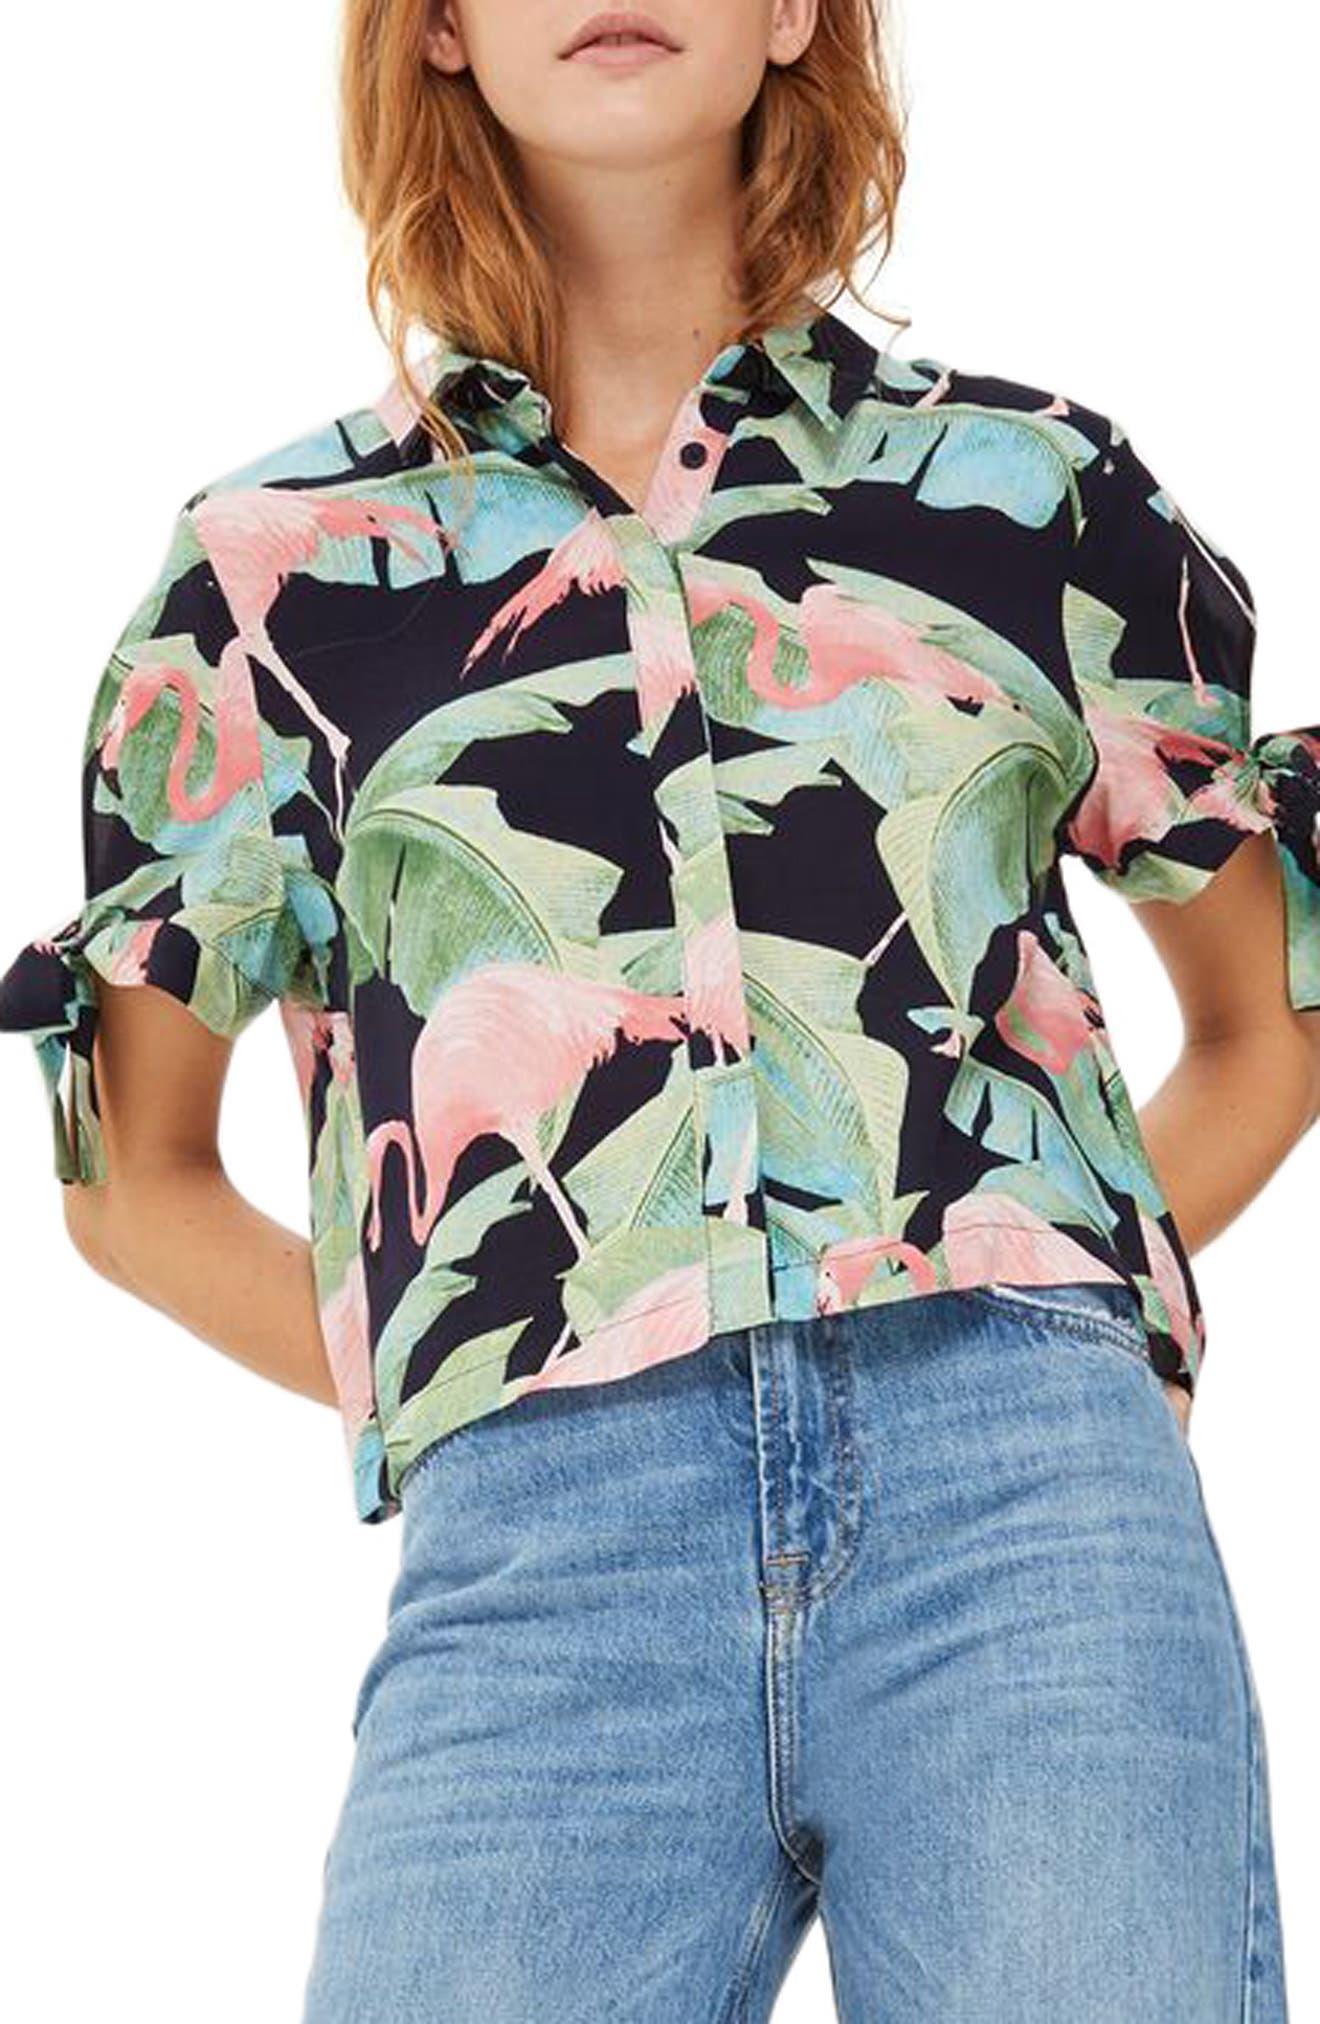 Topshop Tropical Flamingo Print Shirt